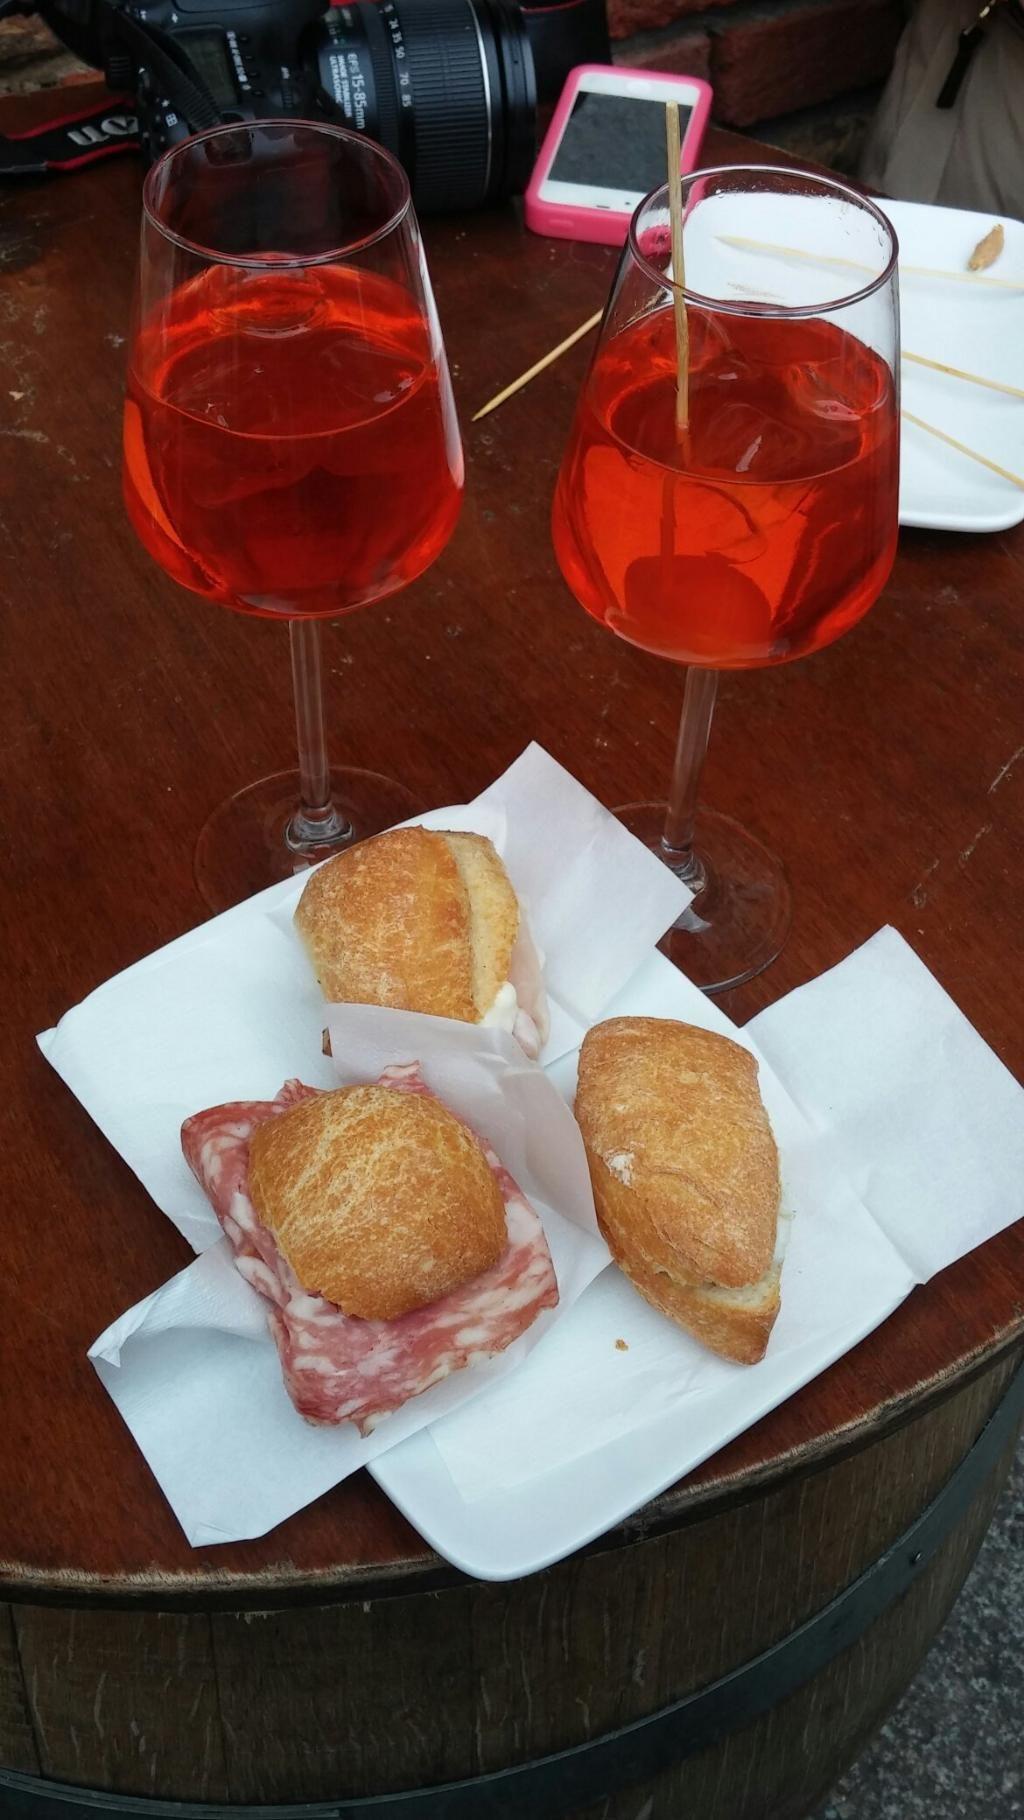 Al Merca Spritz Bar And Sandwiches Venice Venice Food Restaurant